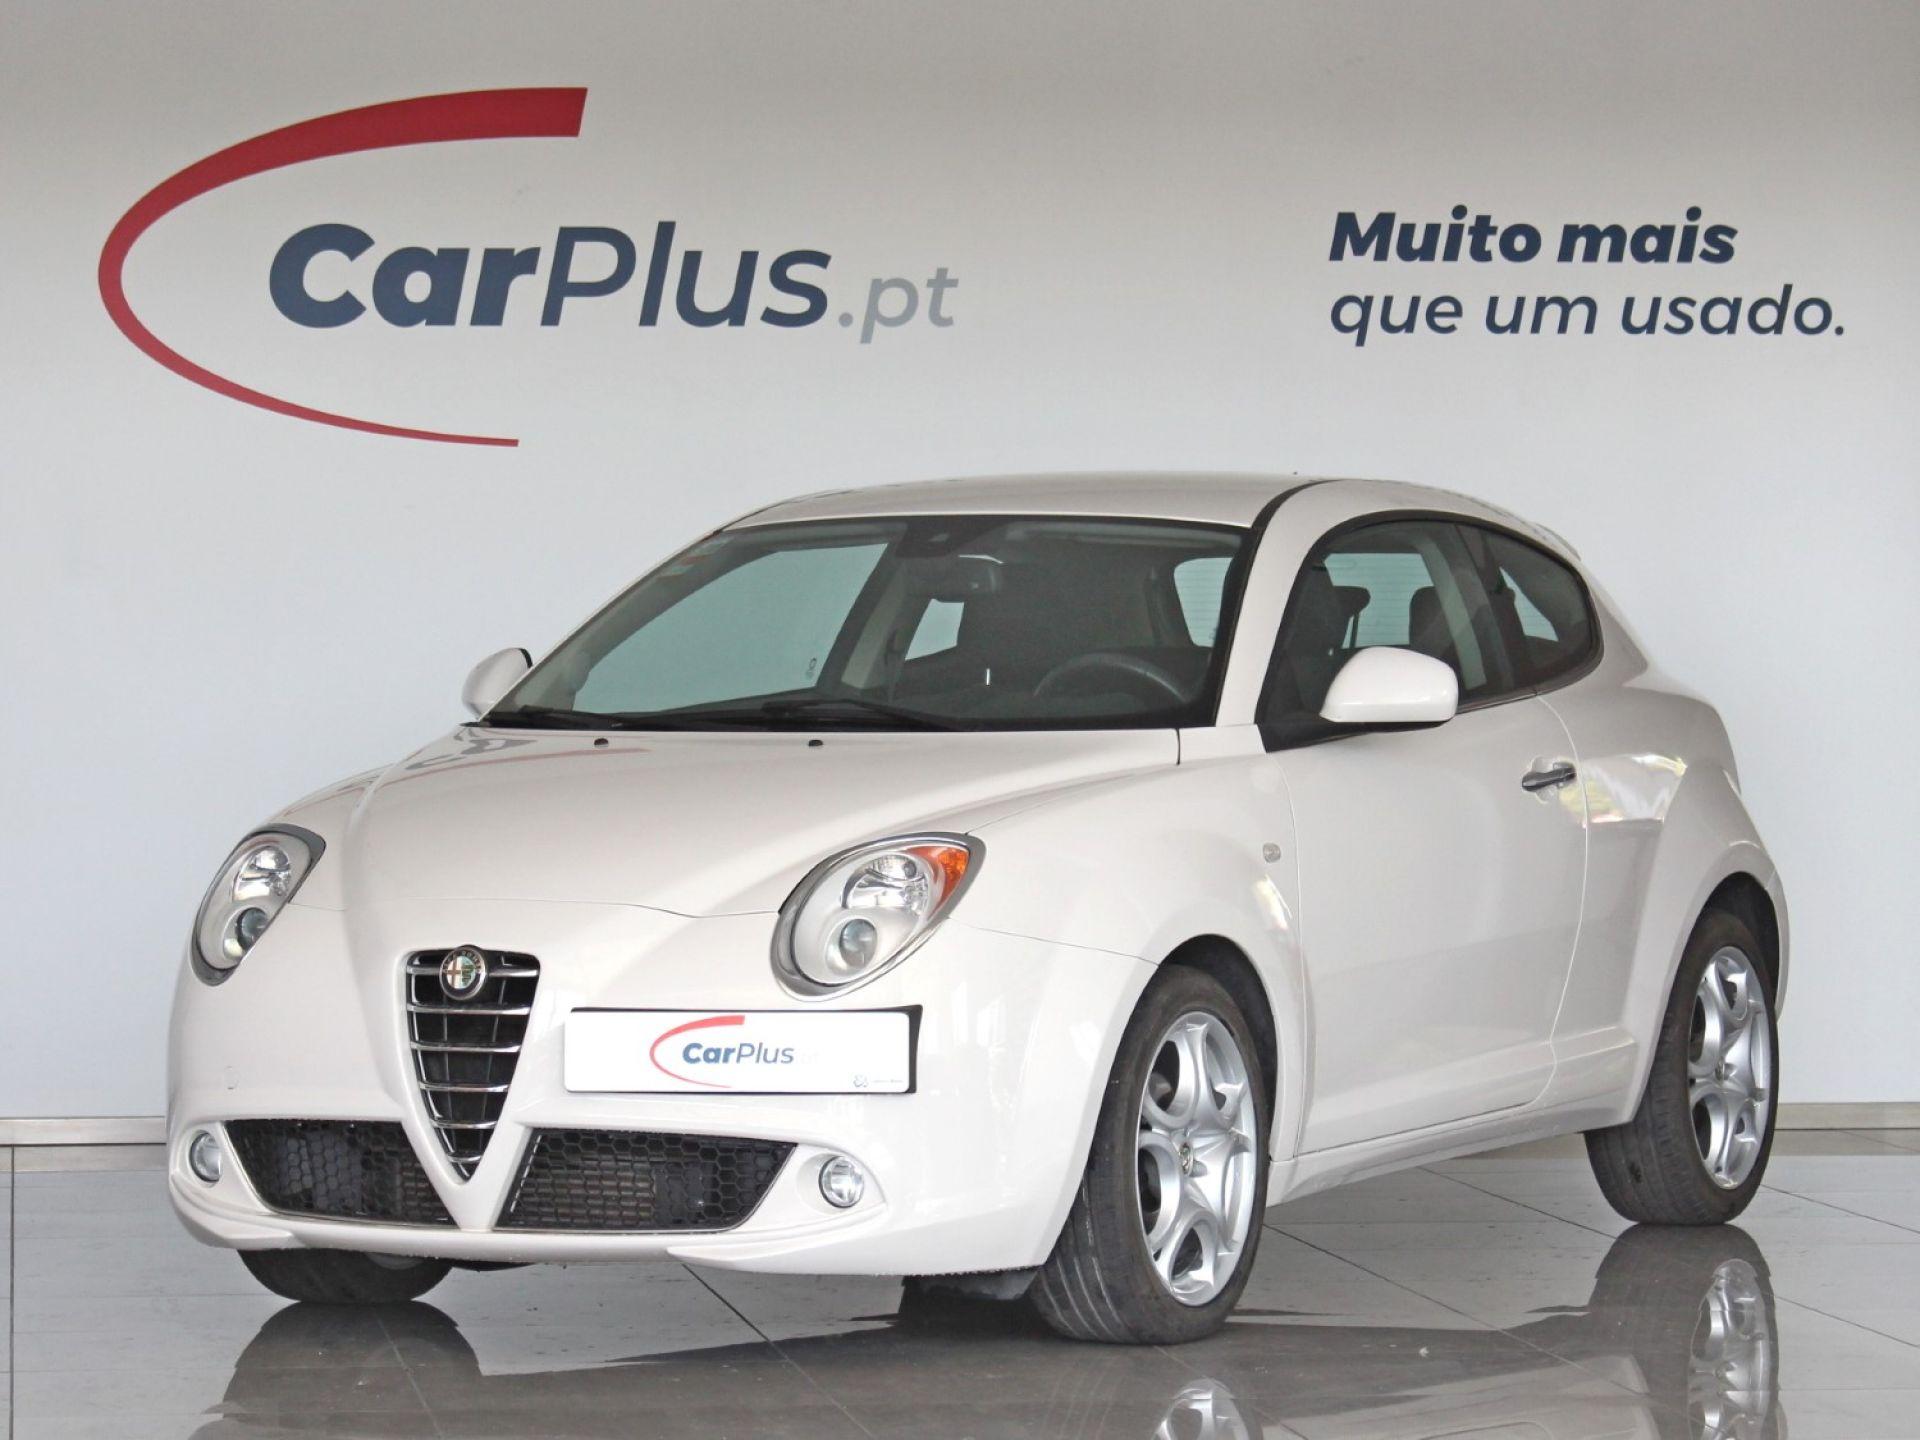 Alfa Romeo Mito MiTo 1.3 JTD 95cv 5KQ Progression segunda mão Braga